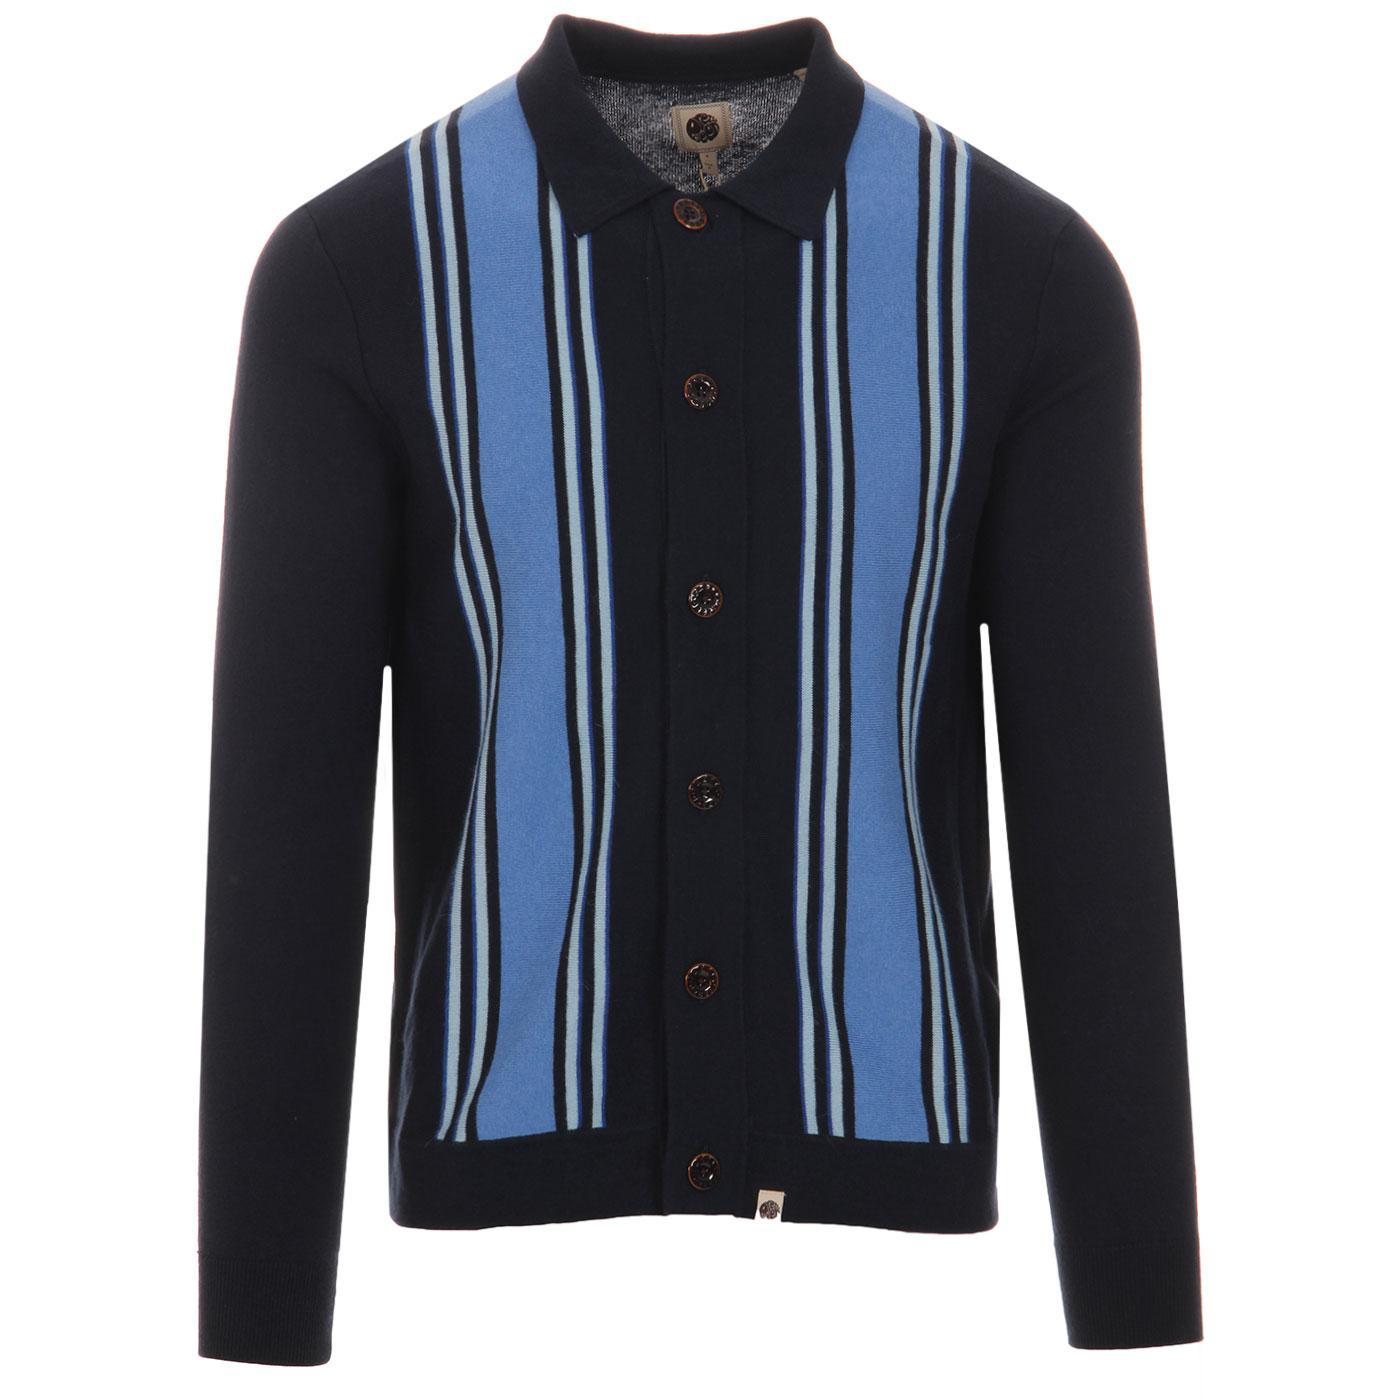 Bingham PRETTY GREEN Mod Stripe Knit Polo Cardigan